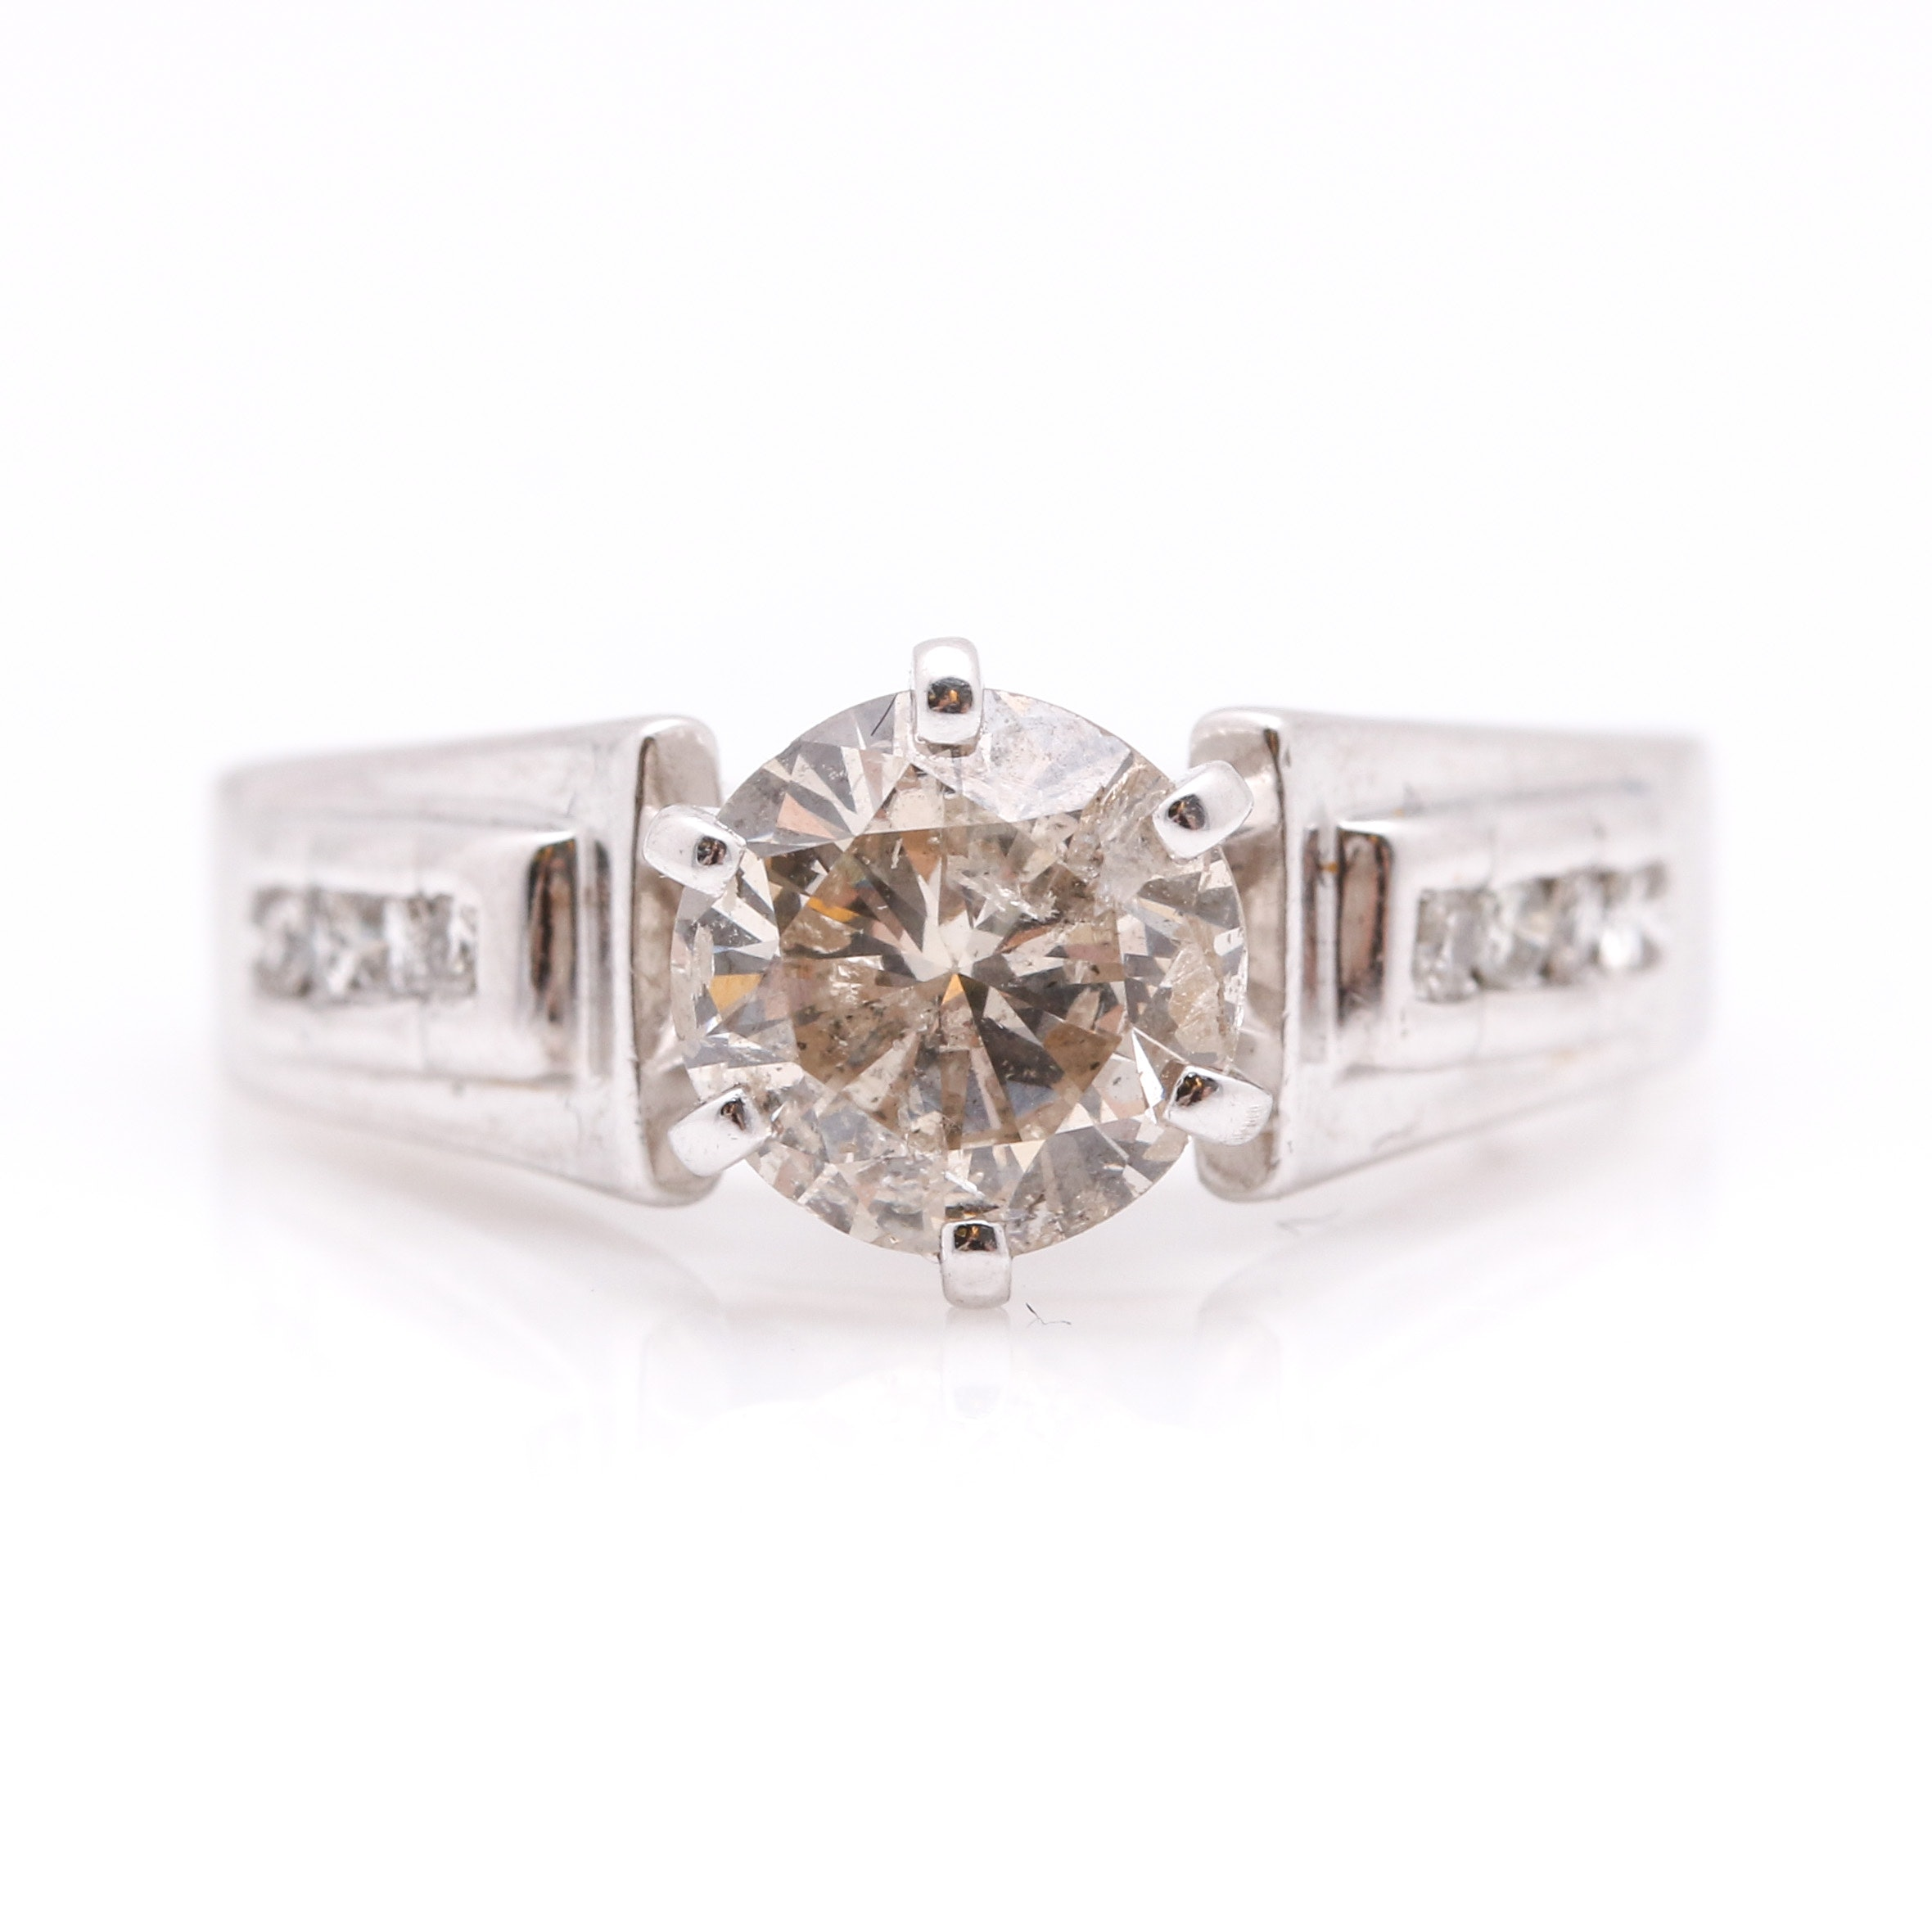 10K White Gold 1.42 CTW Diamond Ring